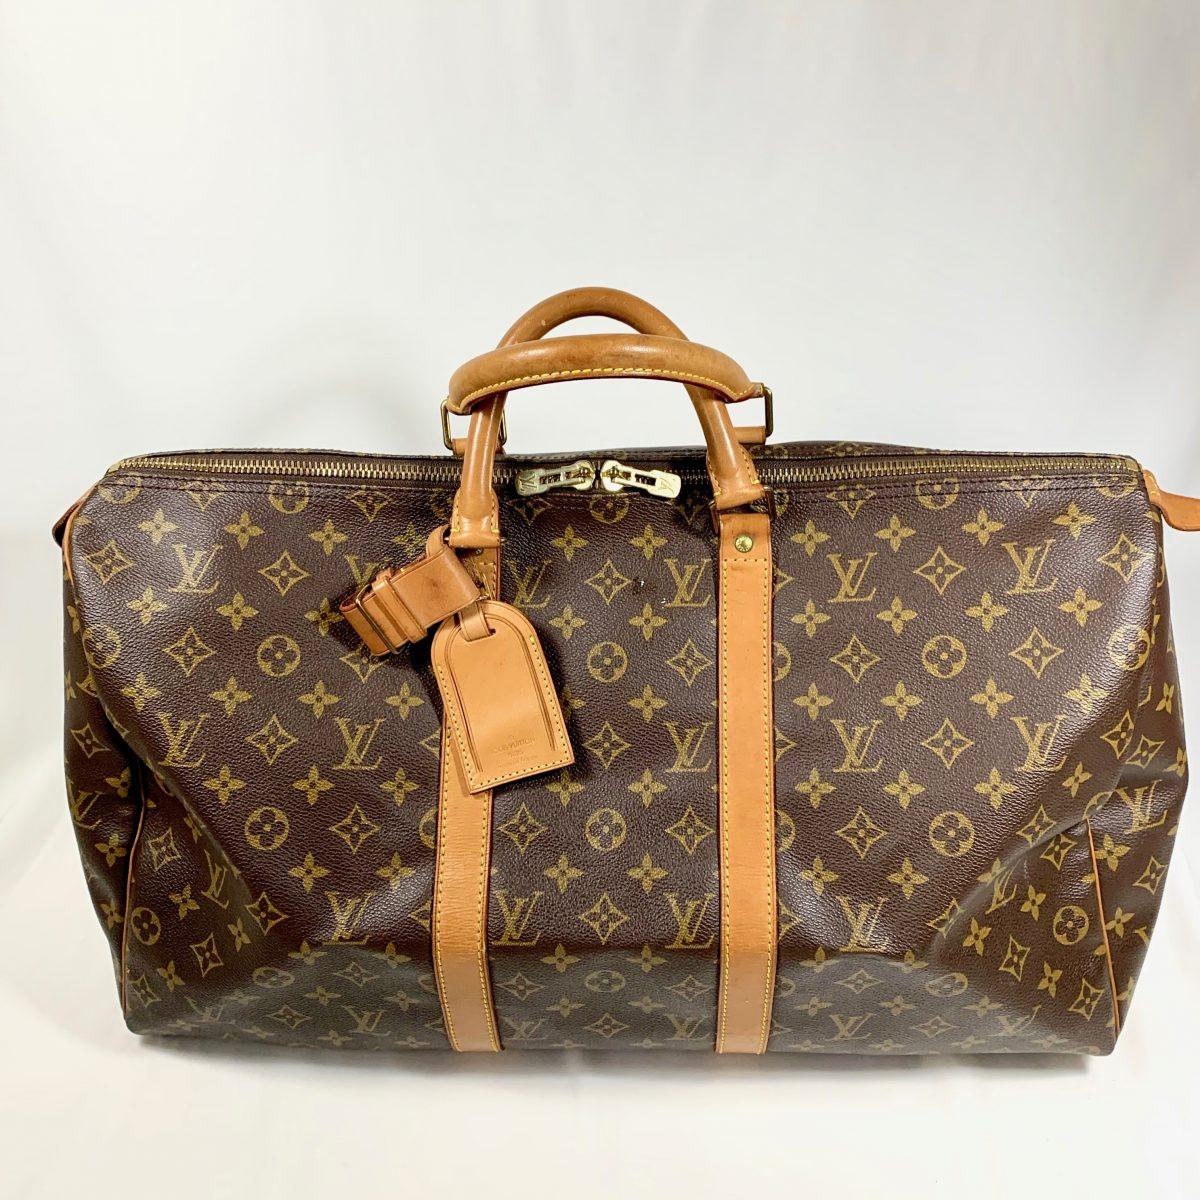 Louis Vuitton Keepall 50 travel designer bag